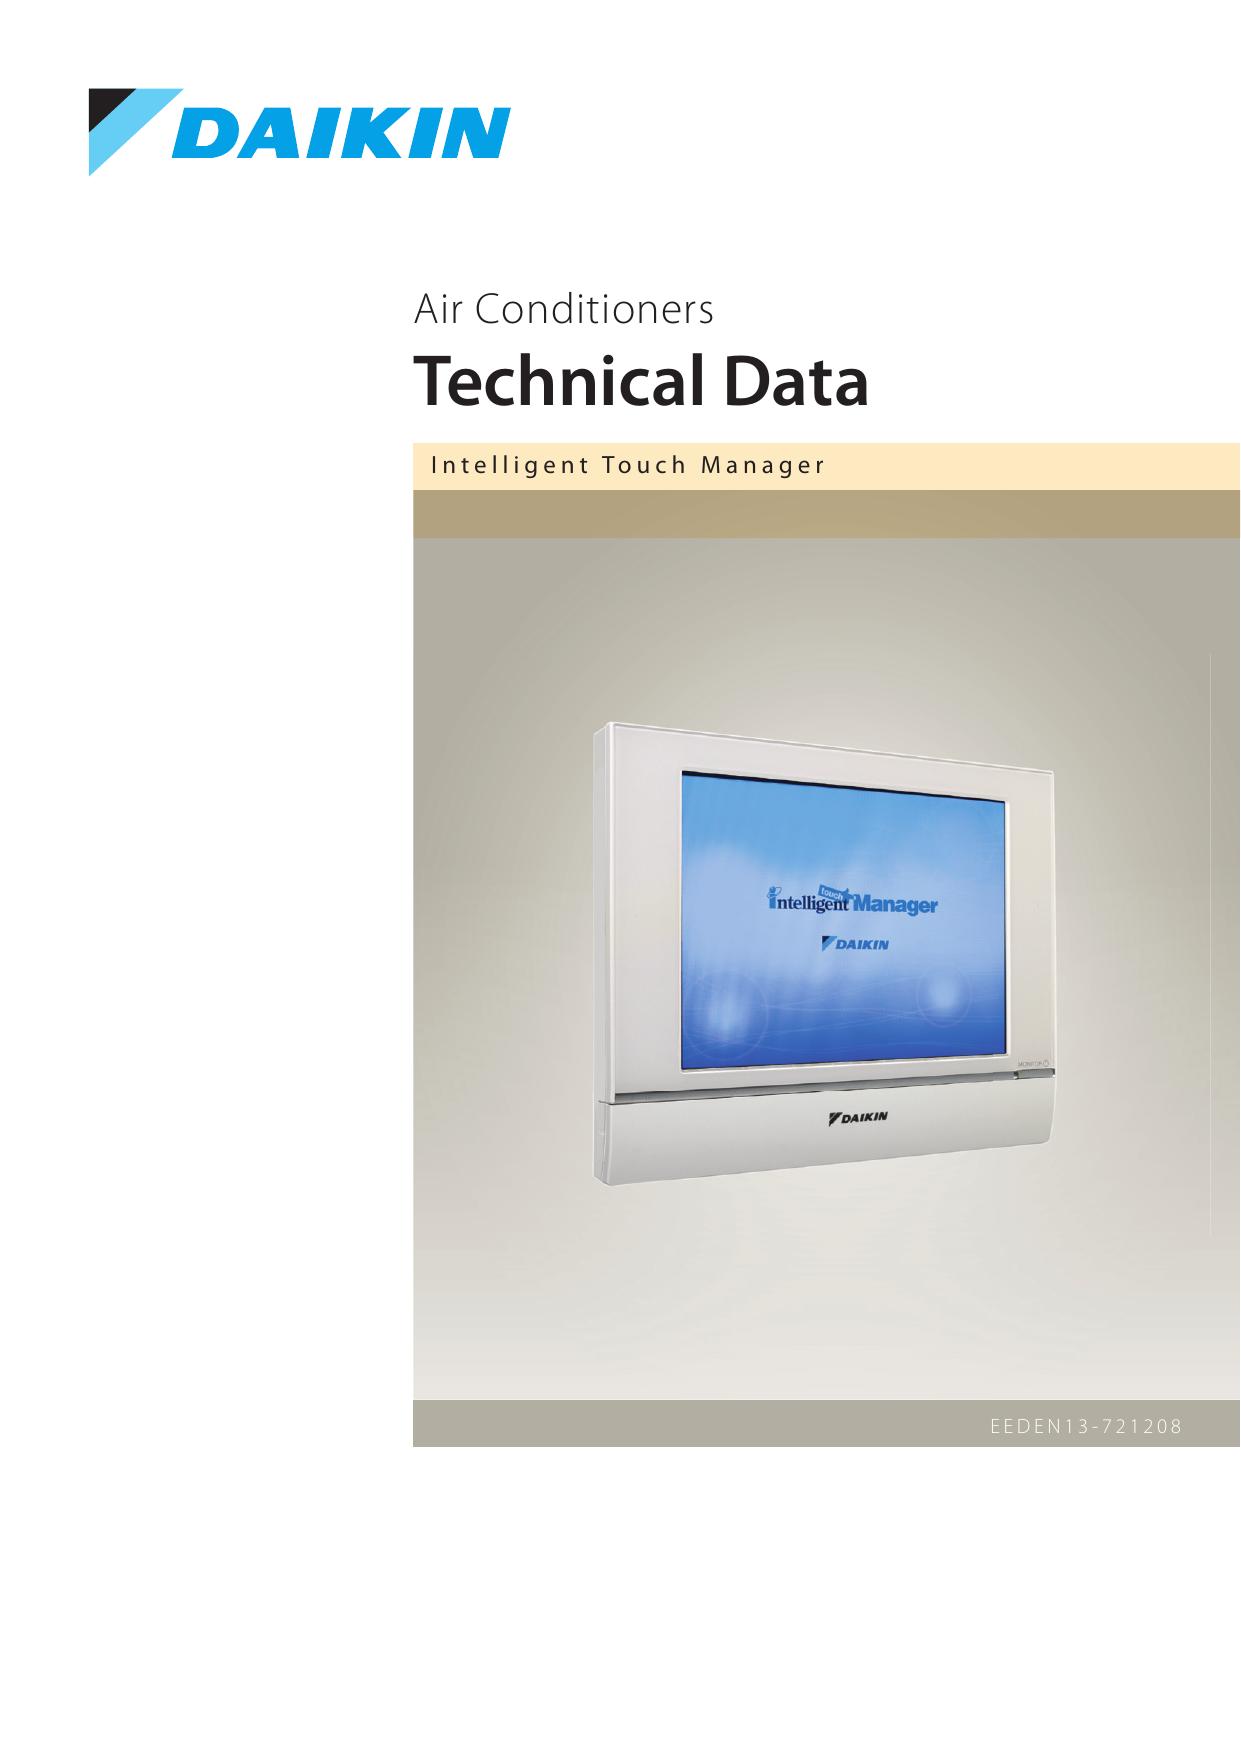 Technical Data Emerson 1081 Wiring Diagram 230v